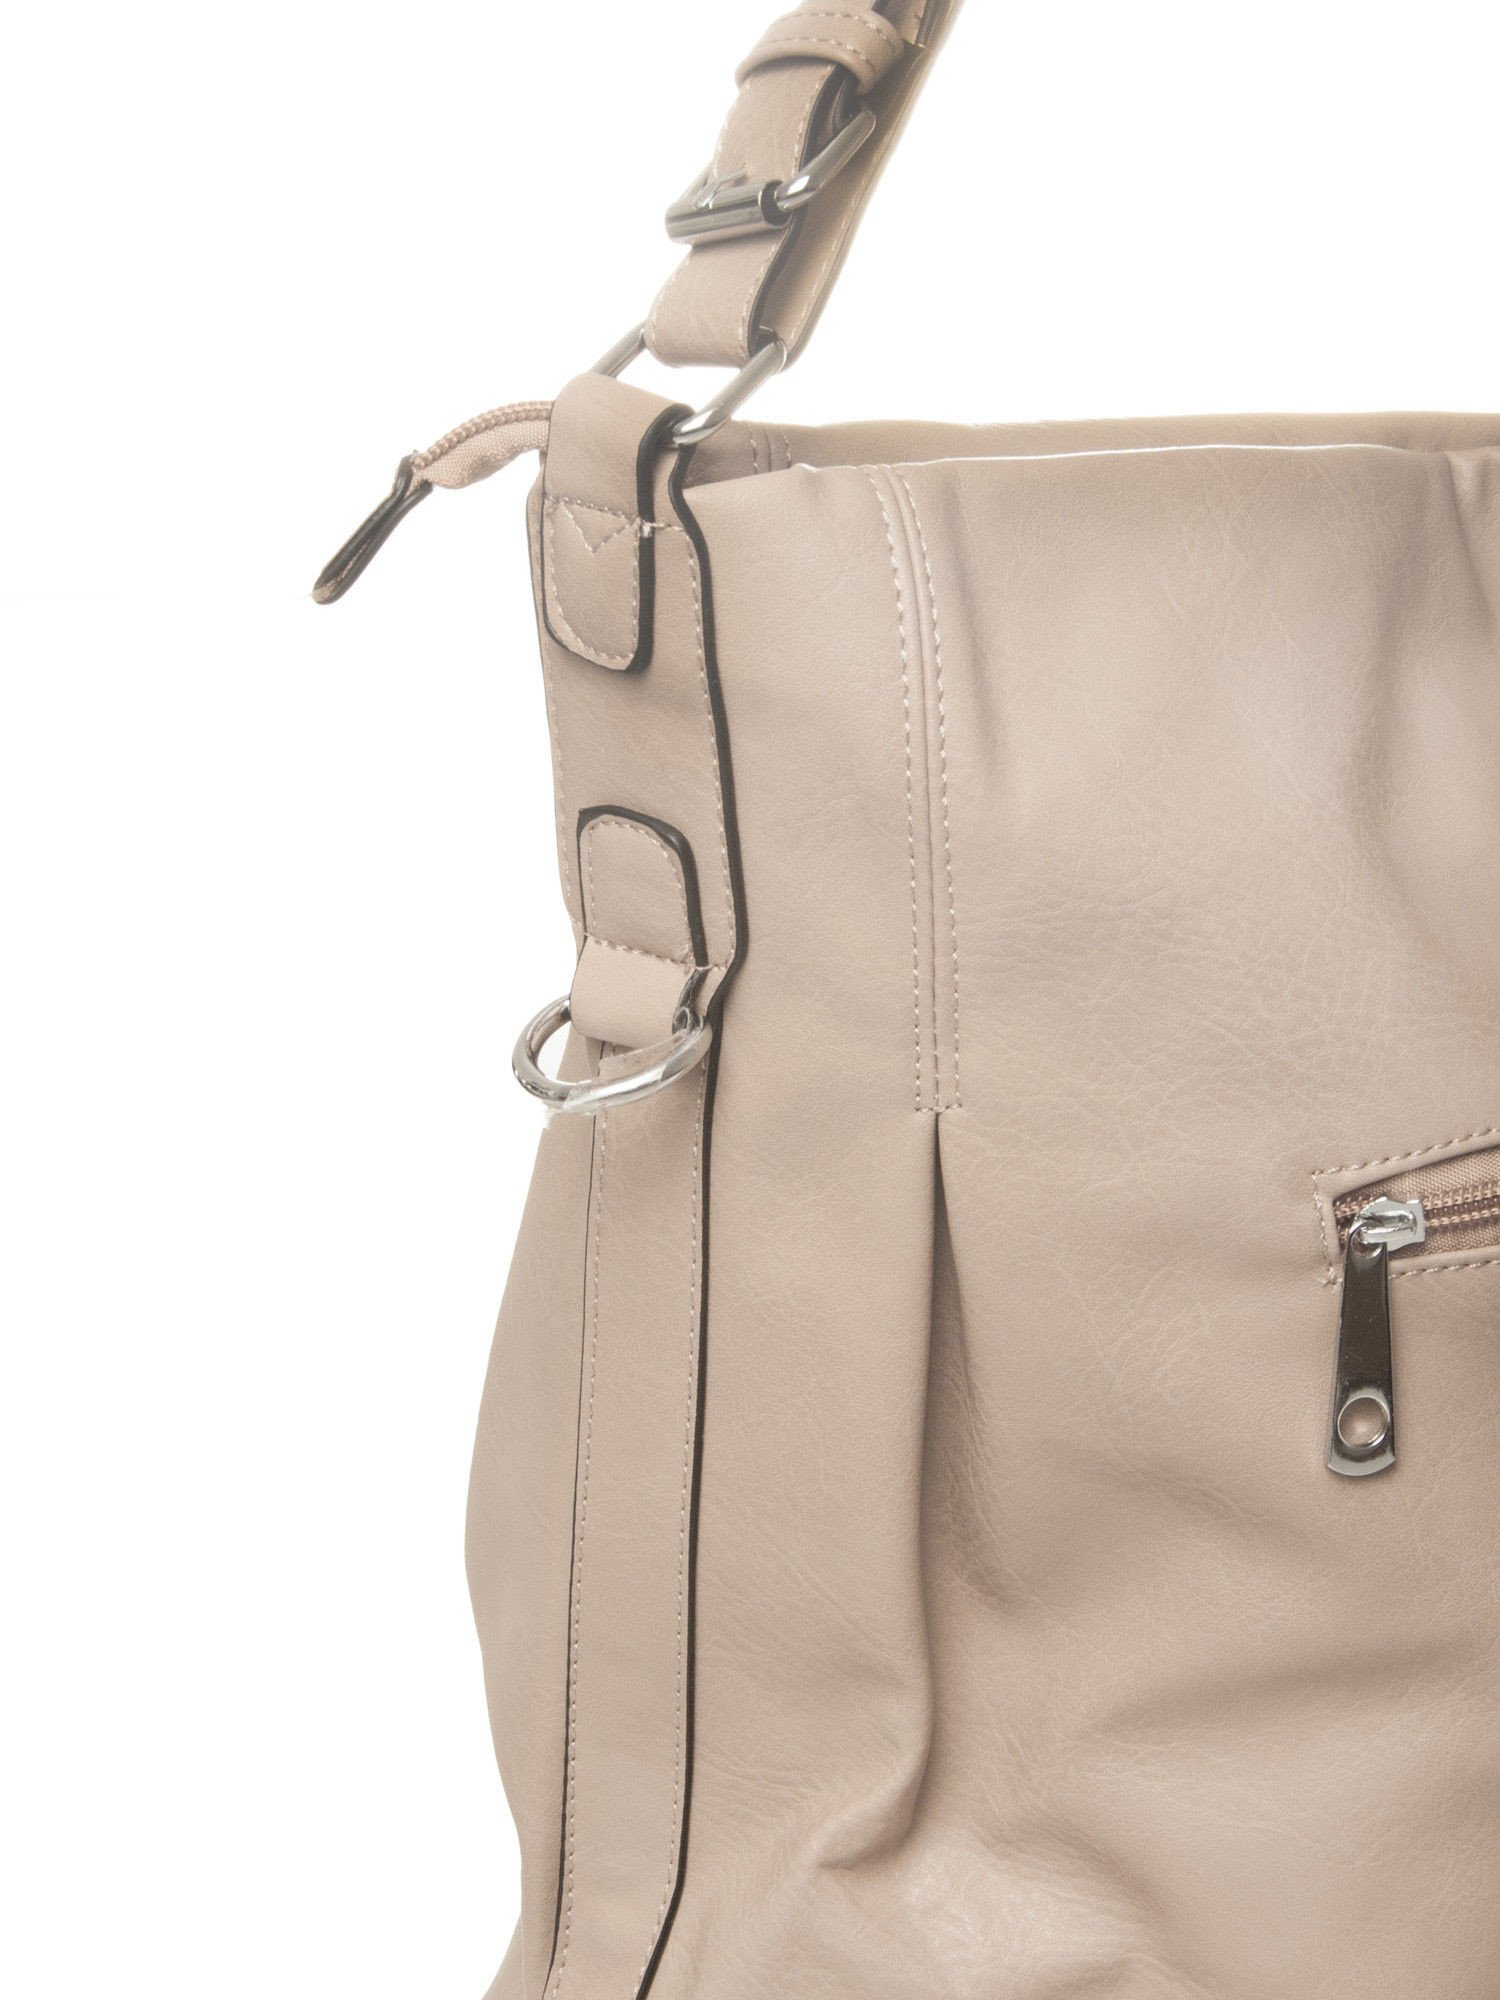 Beżowa torebka hobo na ramię                                  zdj.                                  3